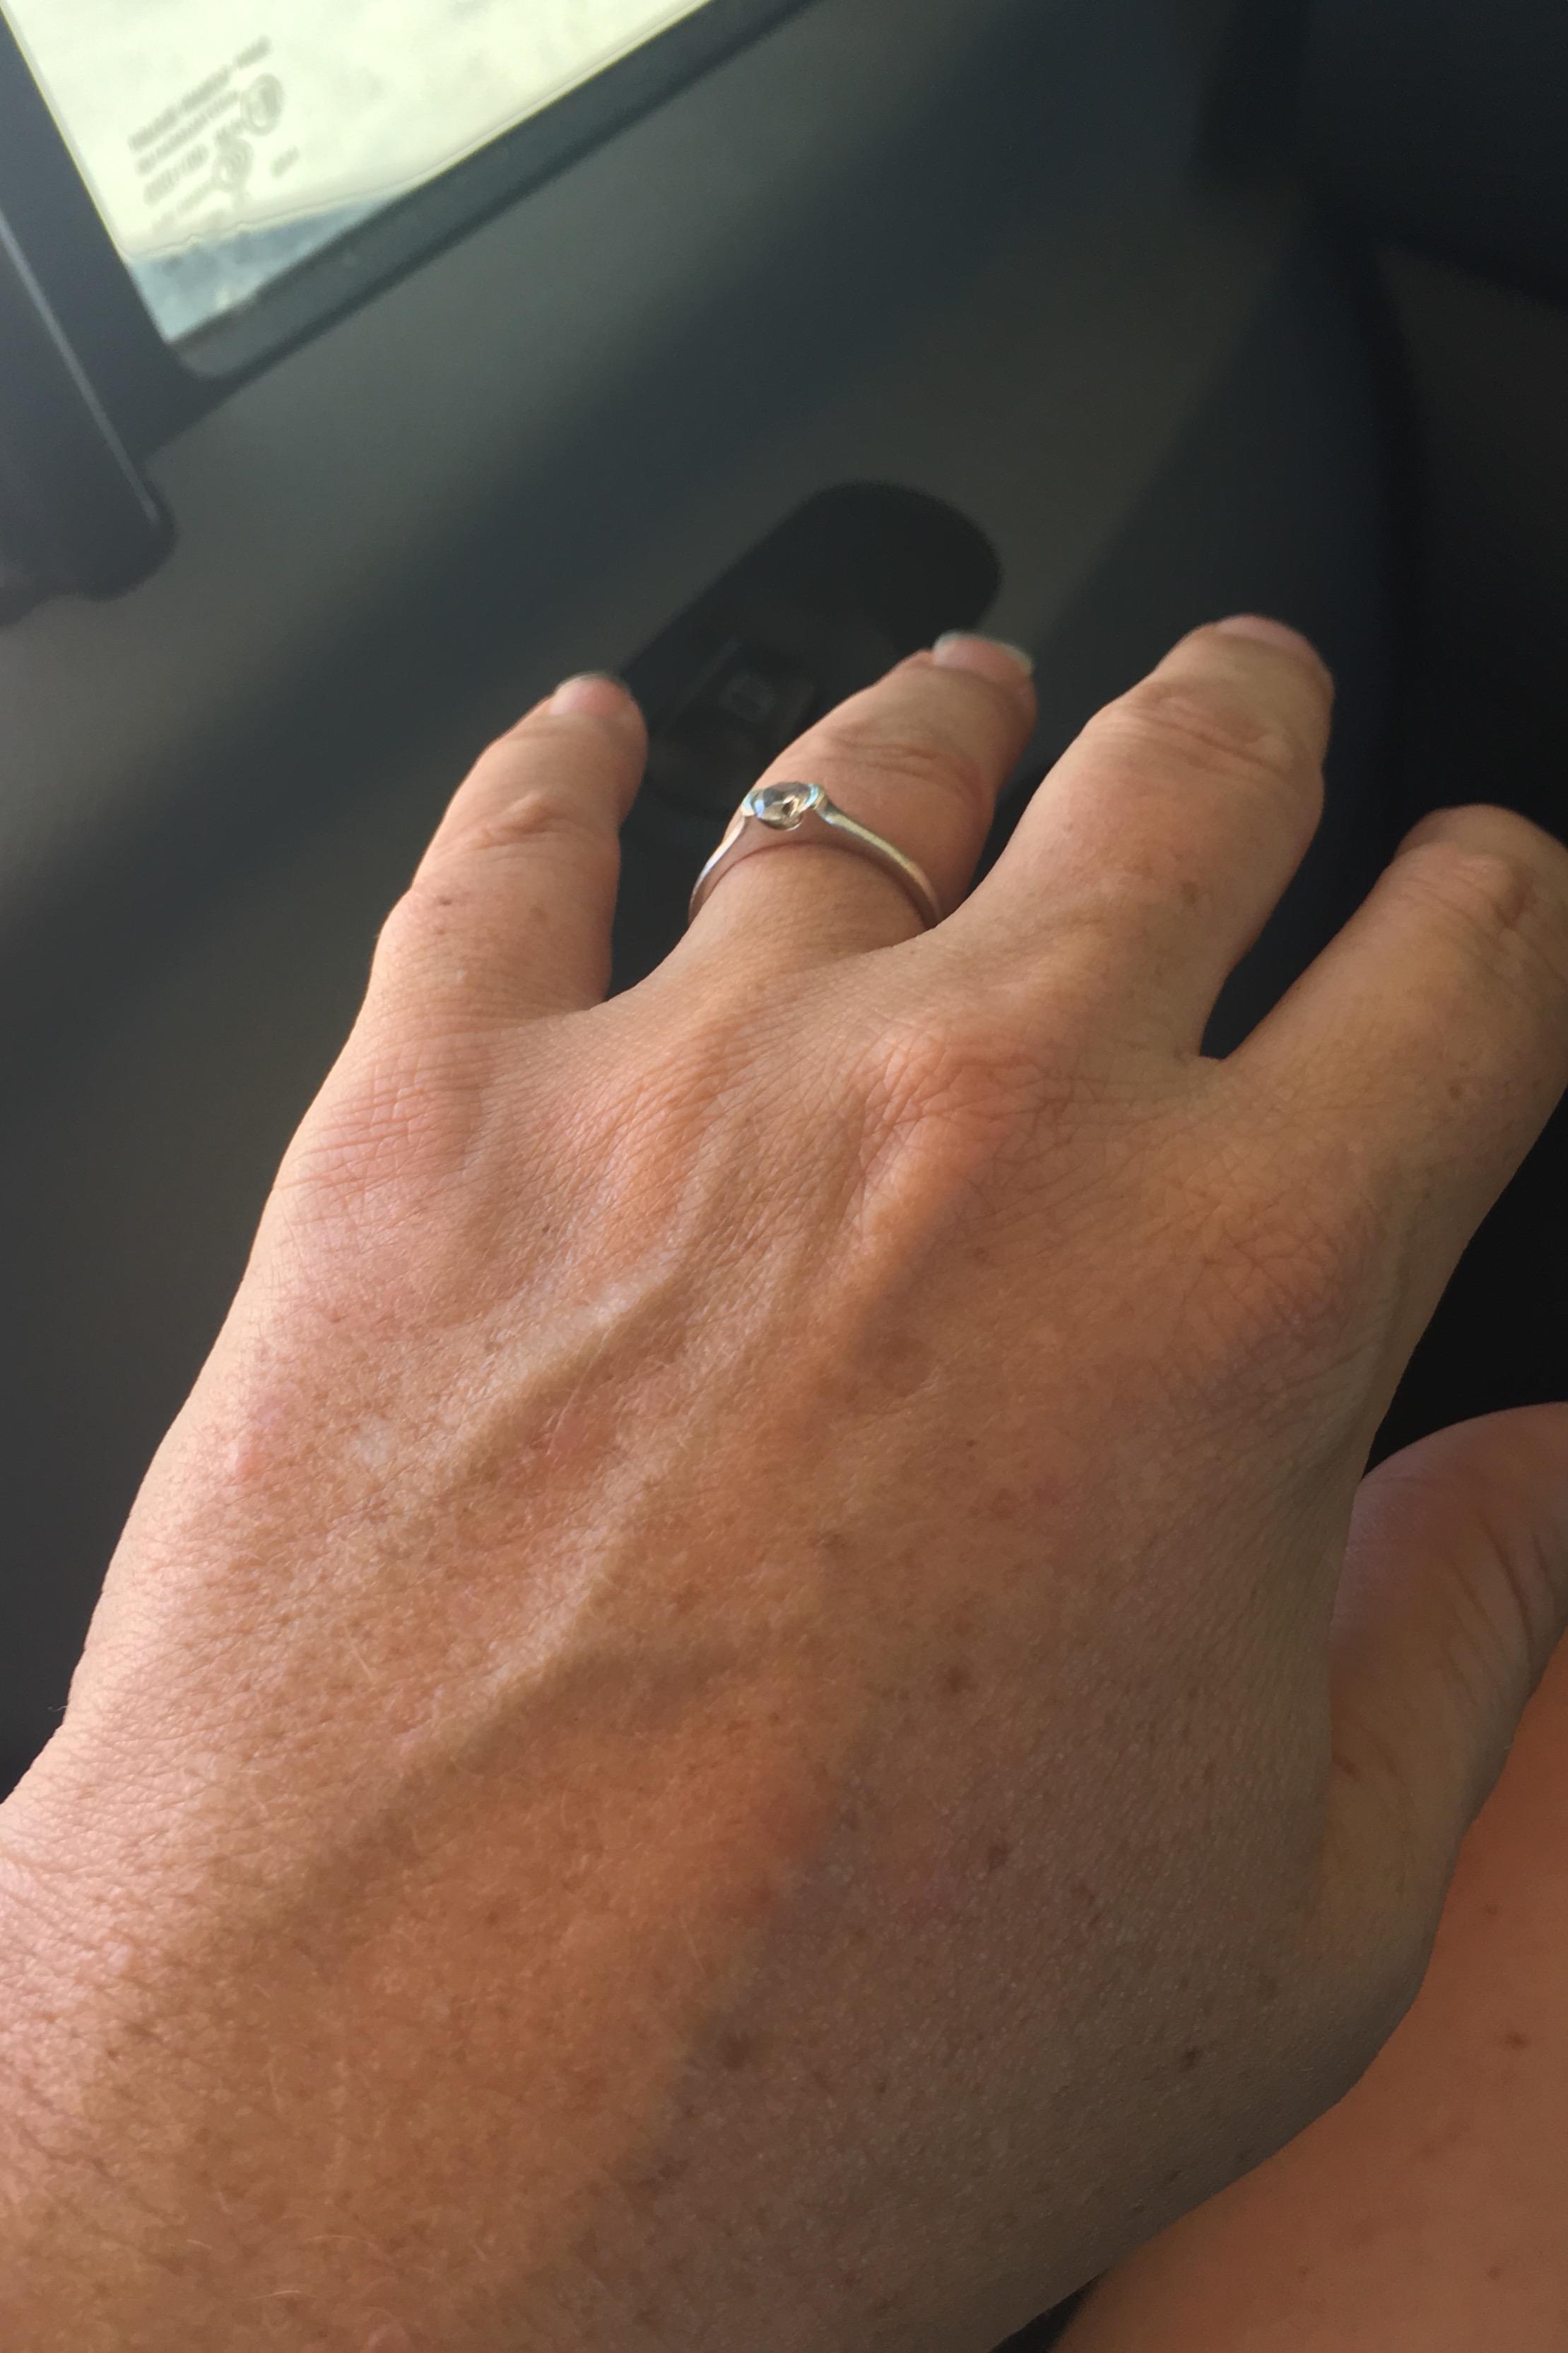 Normal hand